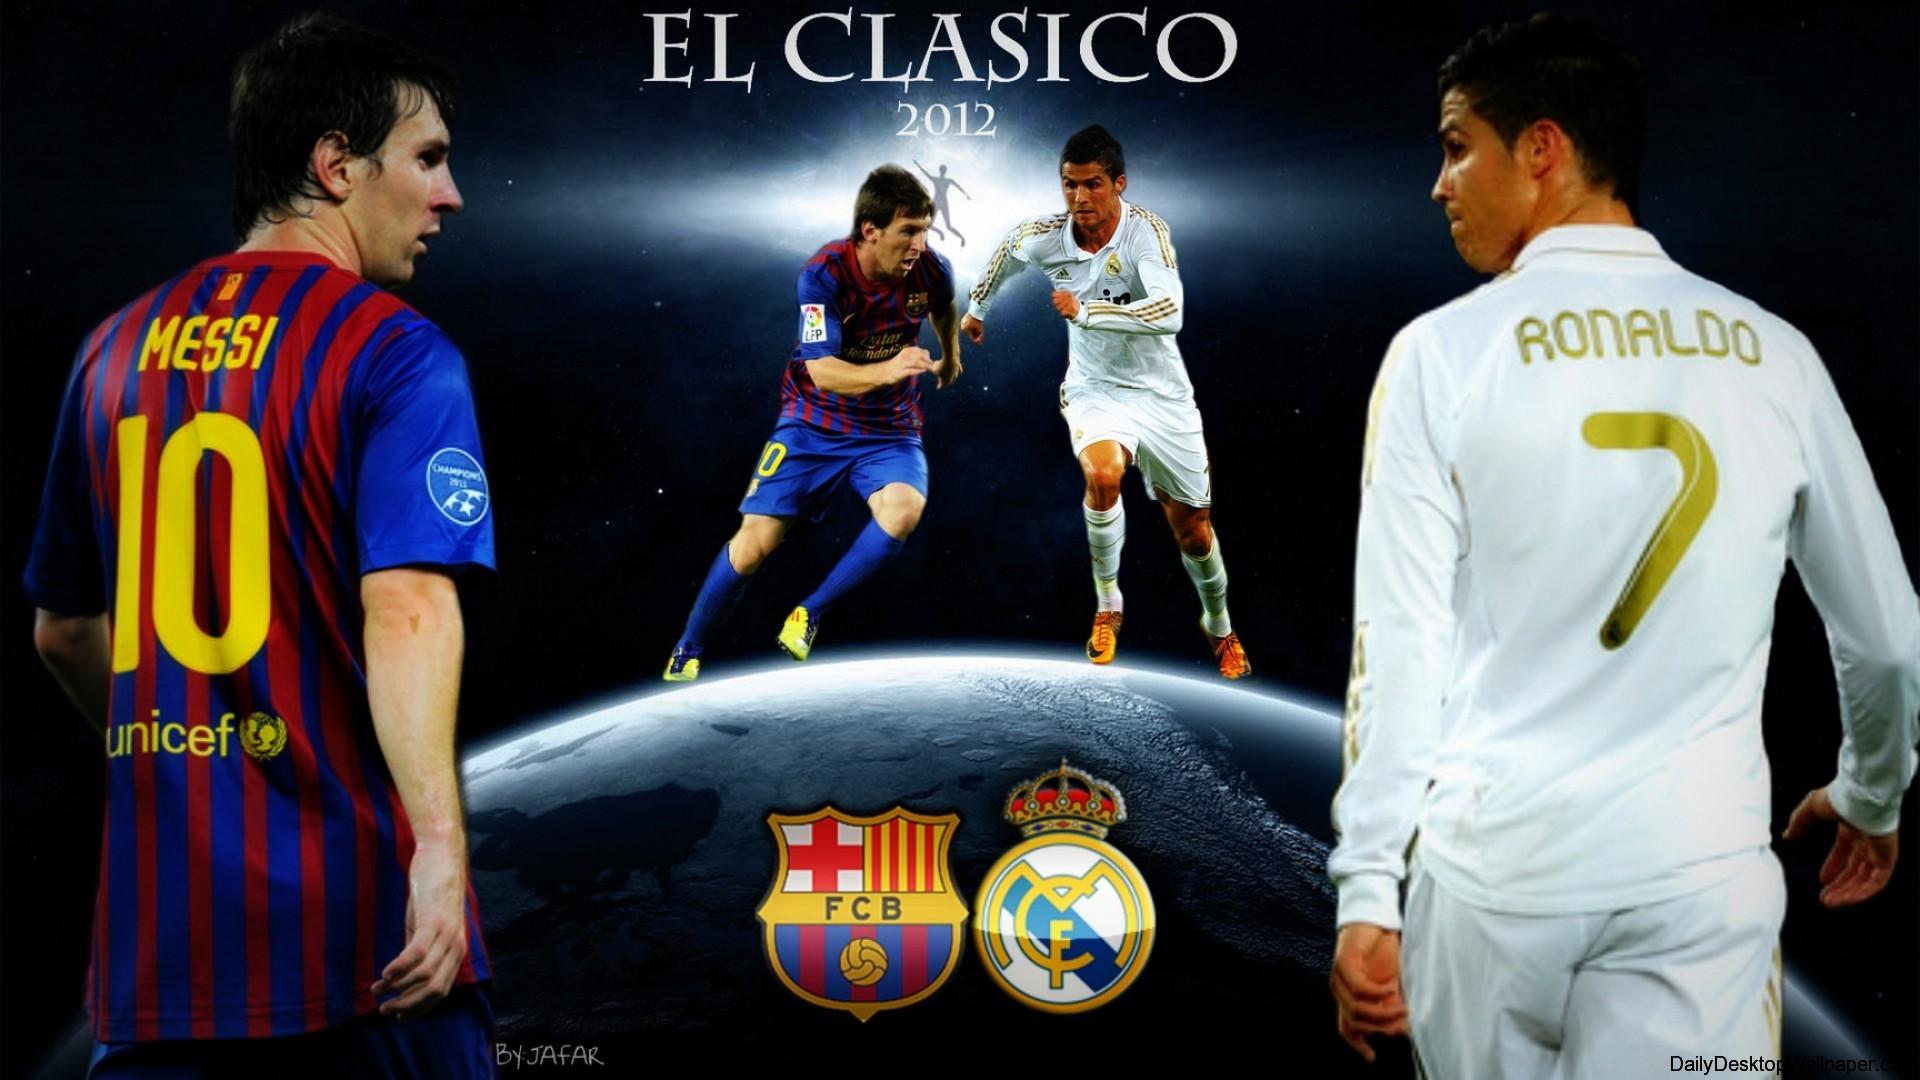 Messi And Ronaldo 2012 Messi wallpaper HD wallpapers 1920x1080